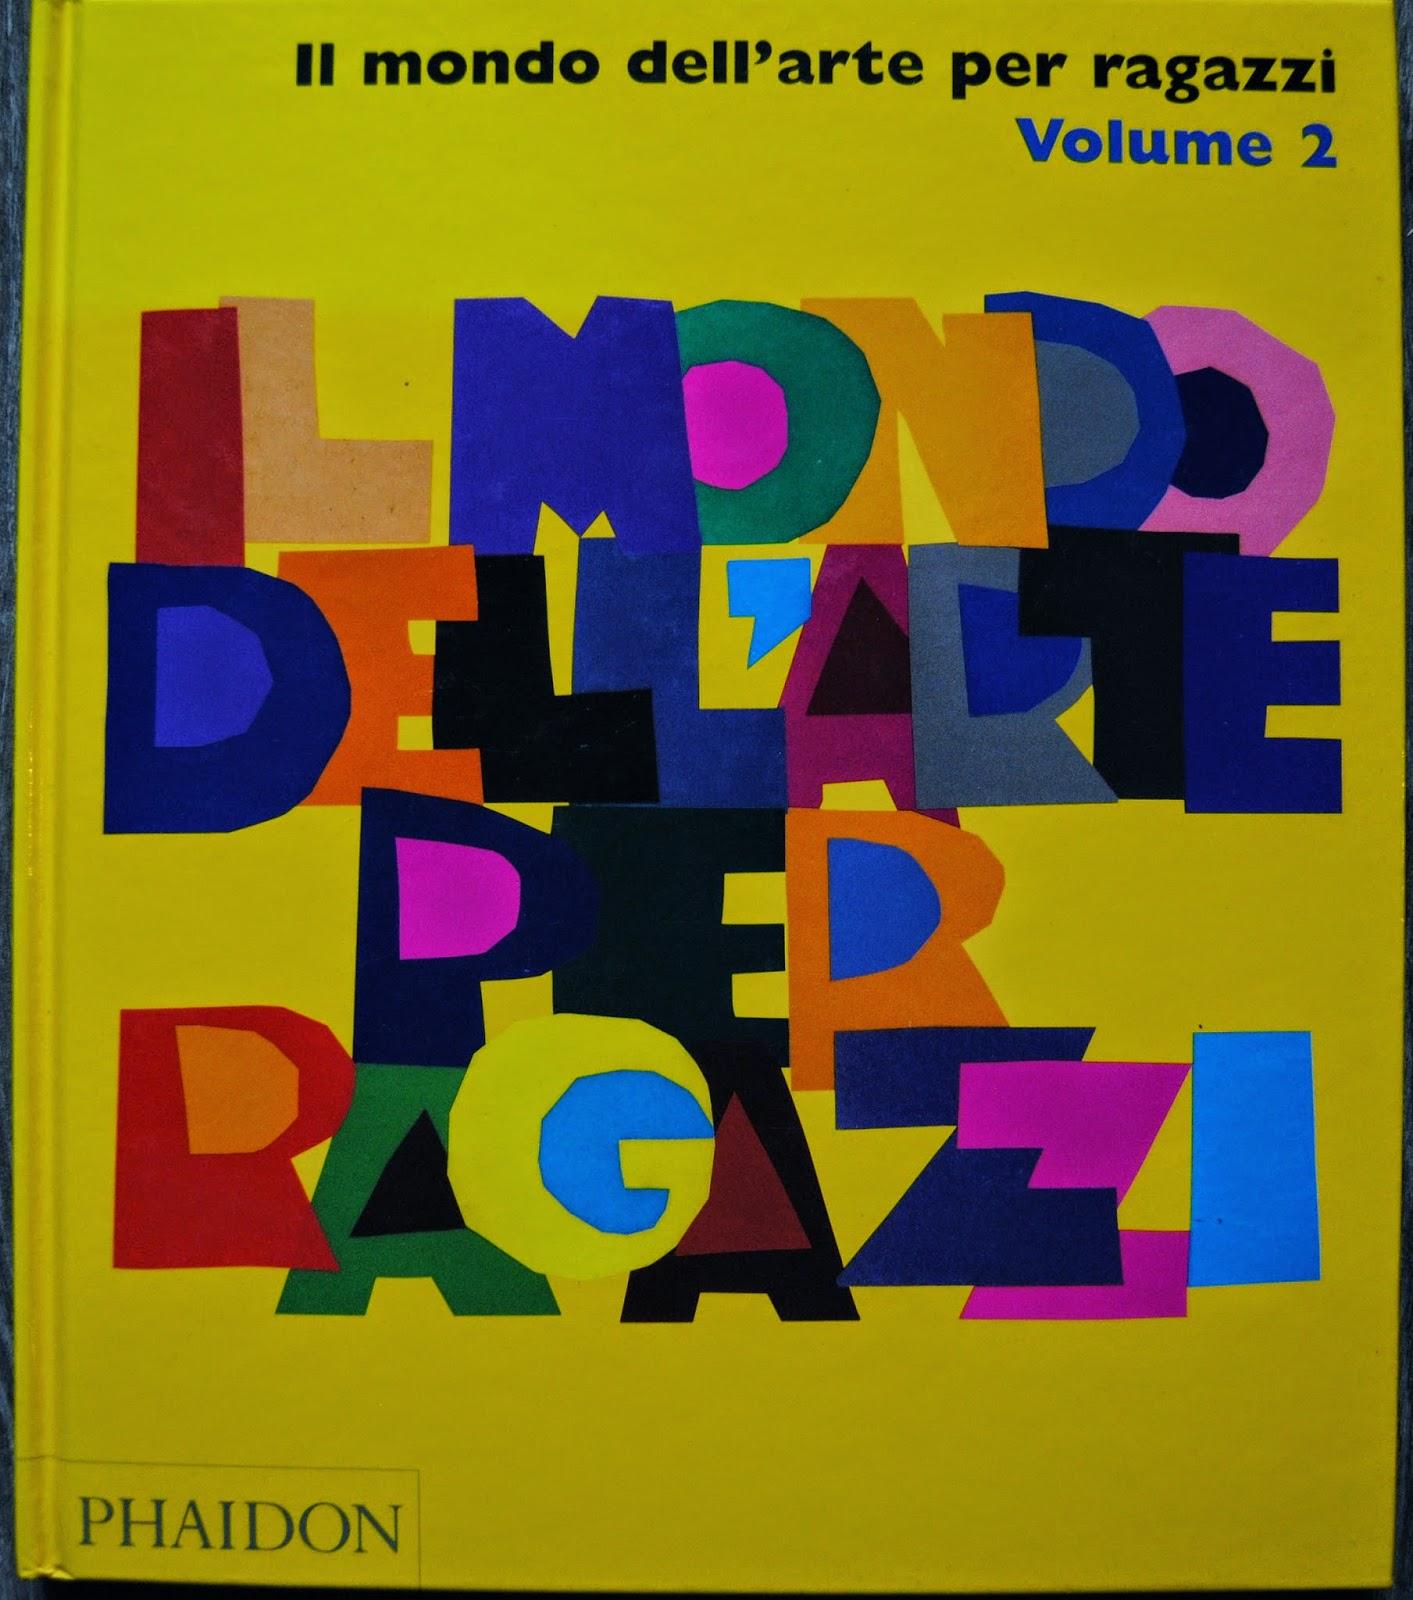 Super PiùArte : Libri d'arte per bambini 1 FN44